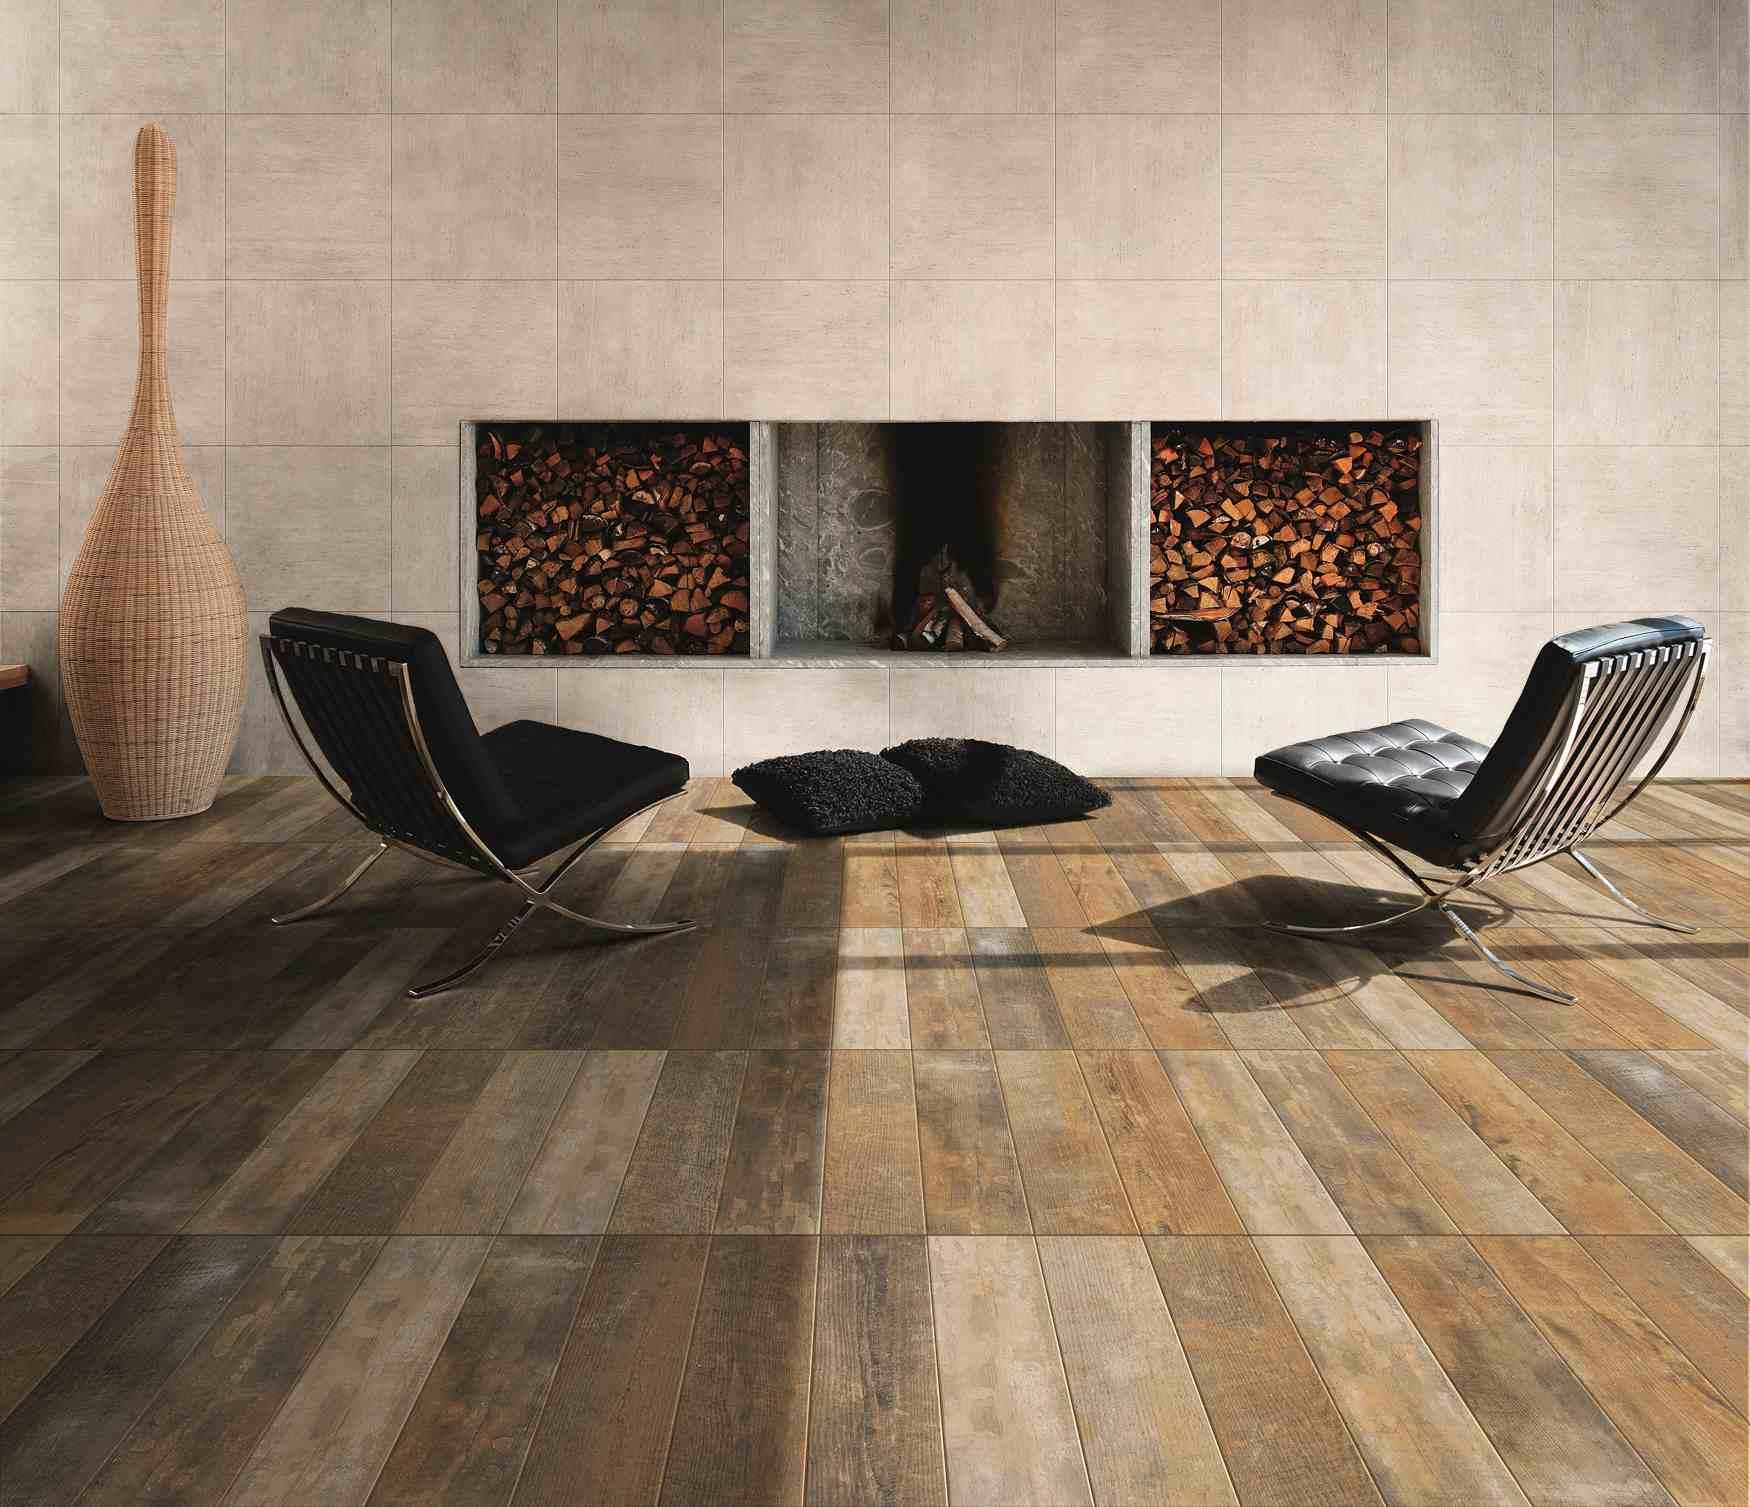 Basta ceramiche simil qualcosa design large blog - Piastrelle simil legno ...